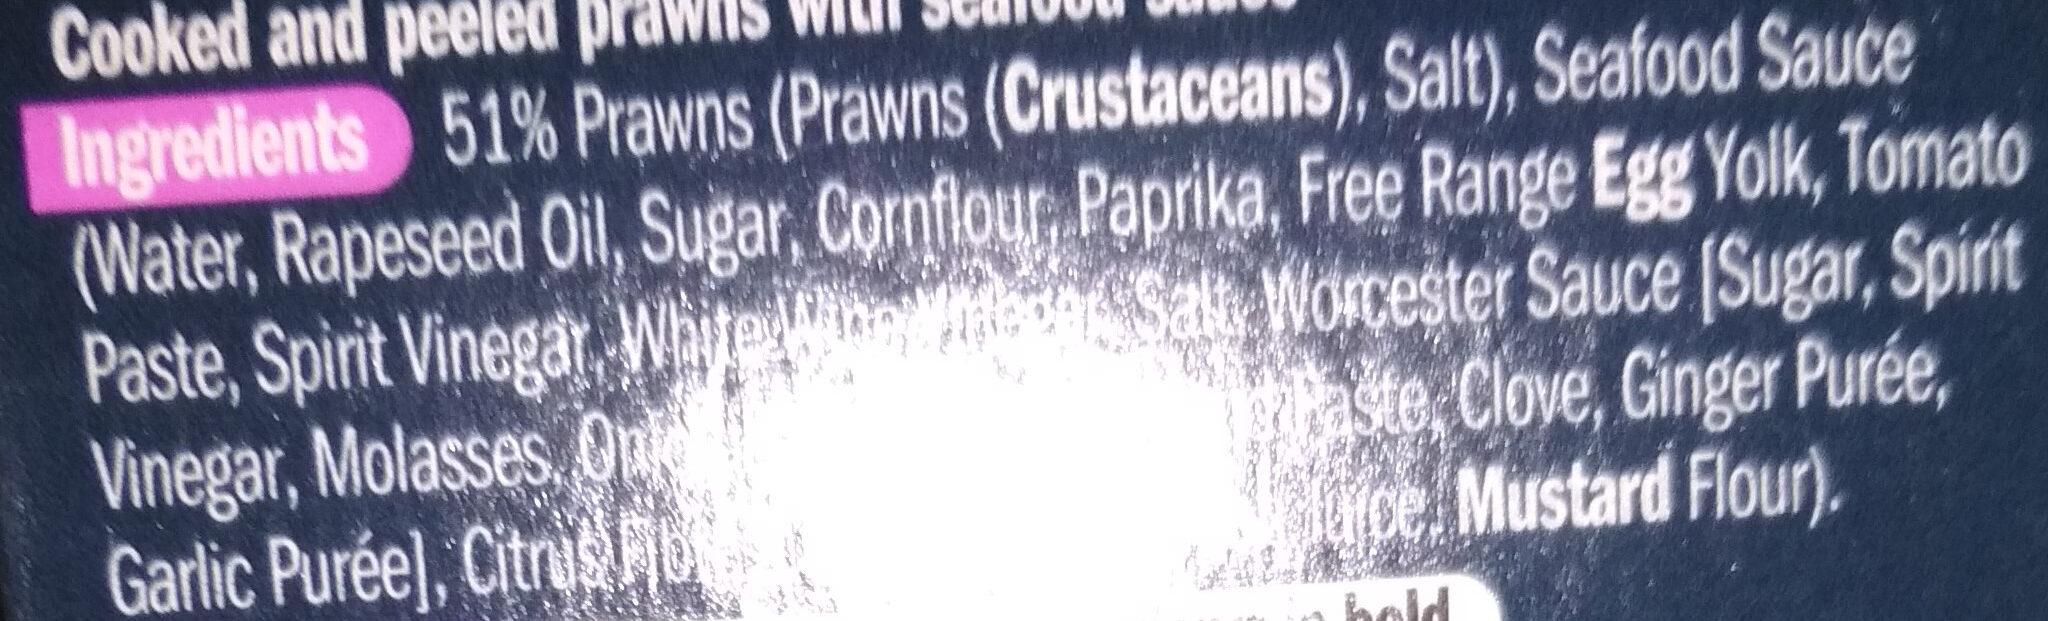 Prawn cocktail - Ingredients - en